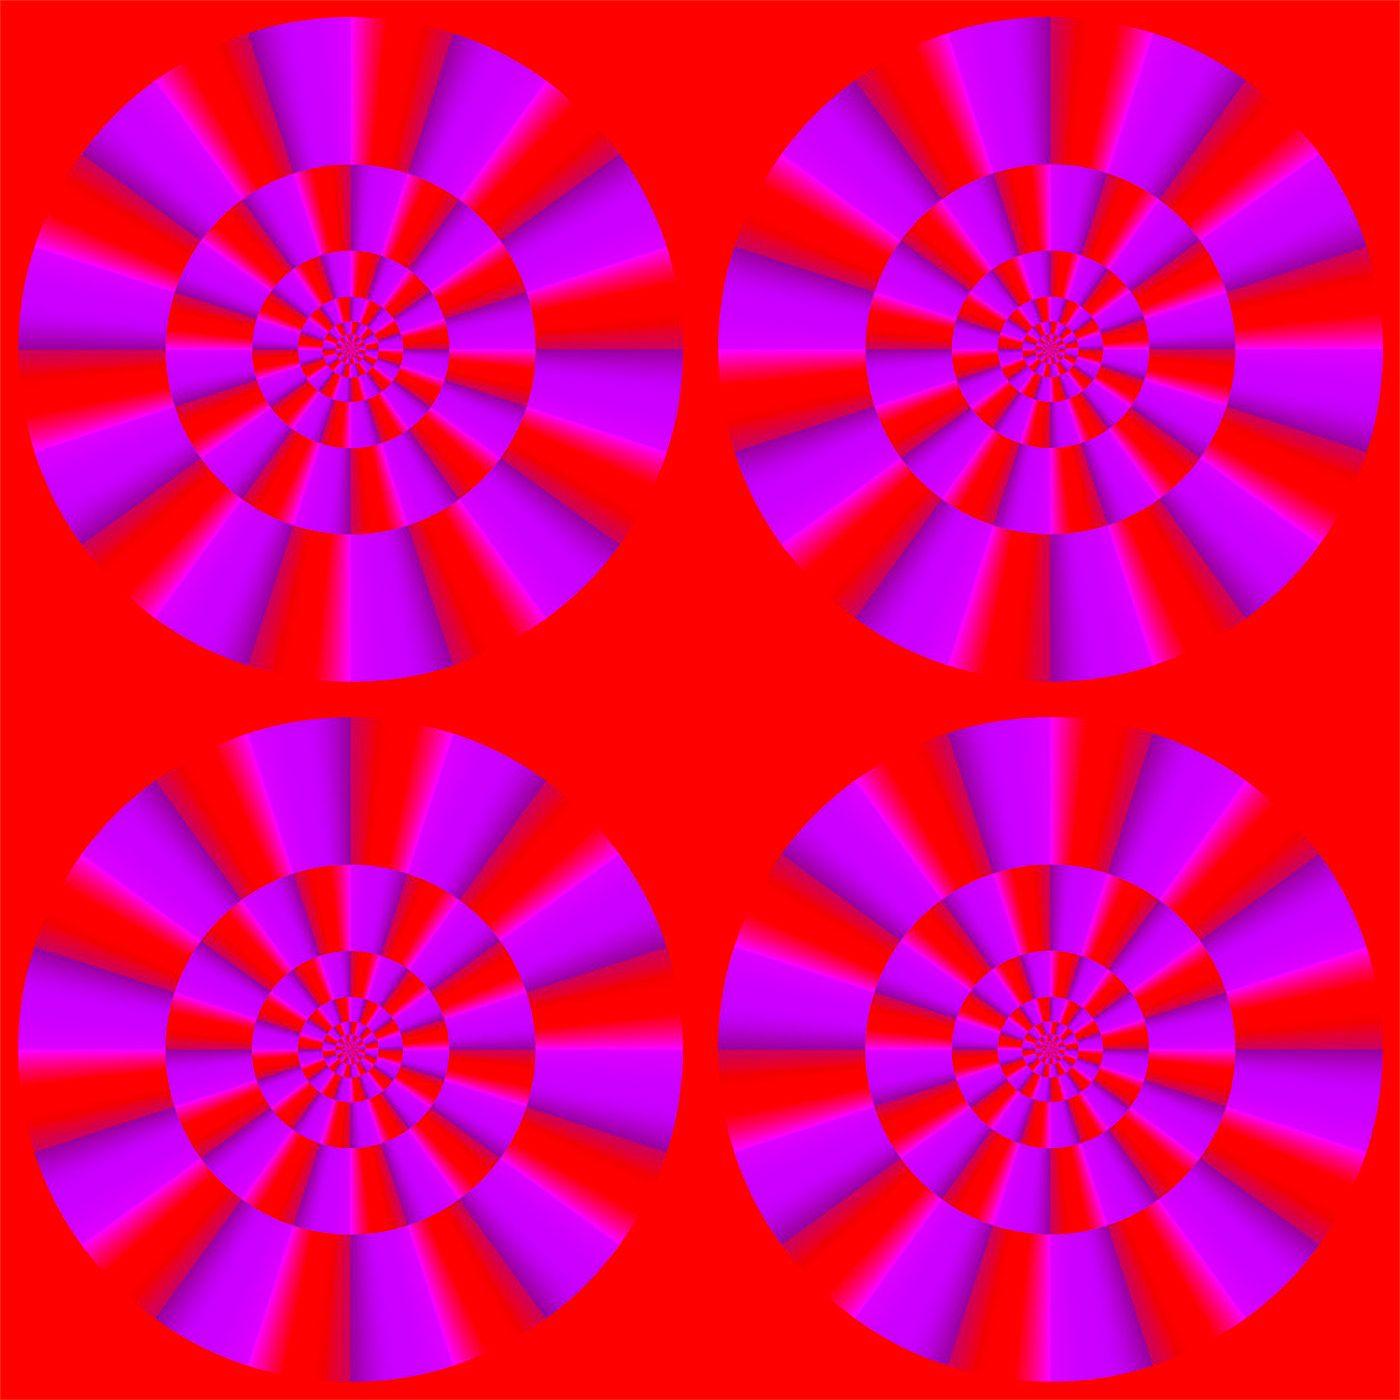 A Trick of the Eye: Optical Illusions by Akiyoshi Kitaoka ...